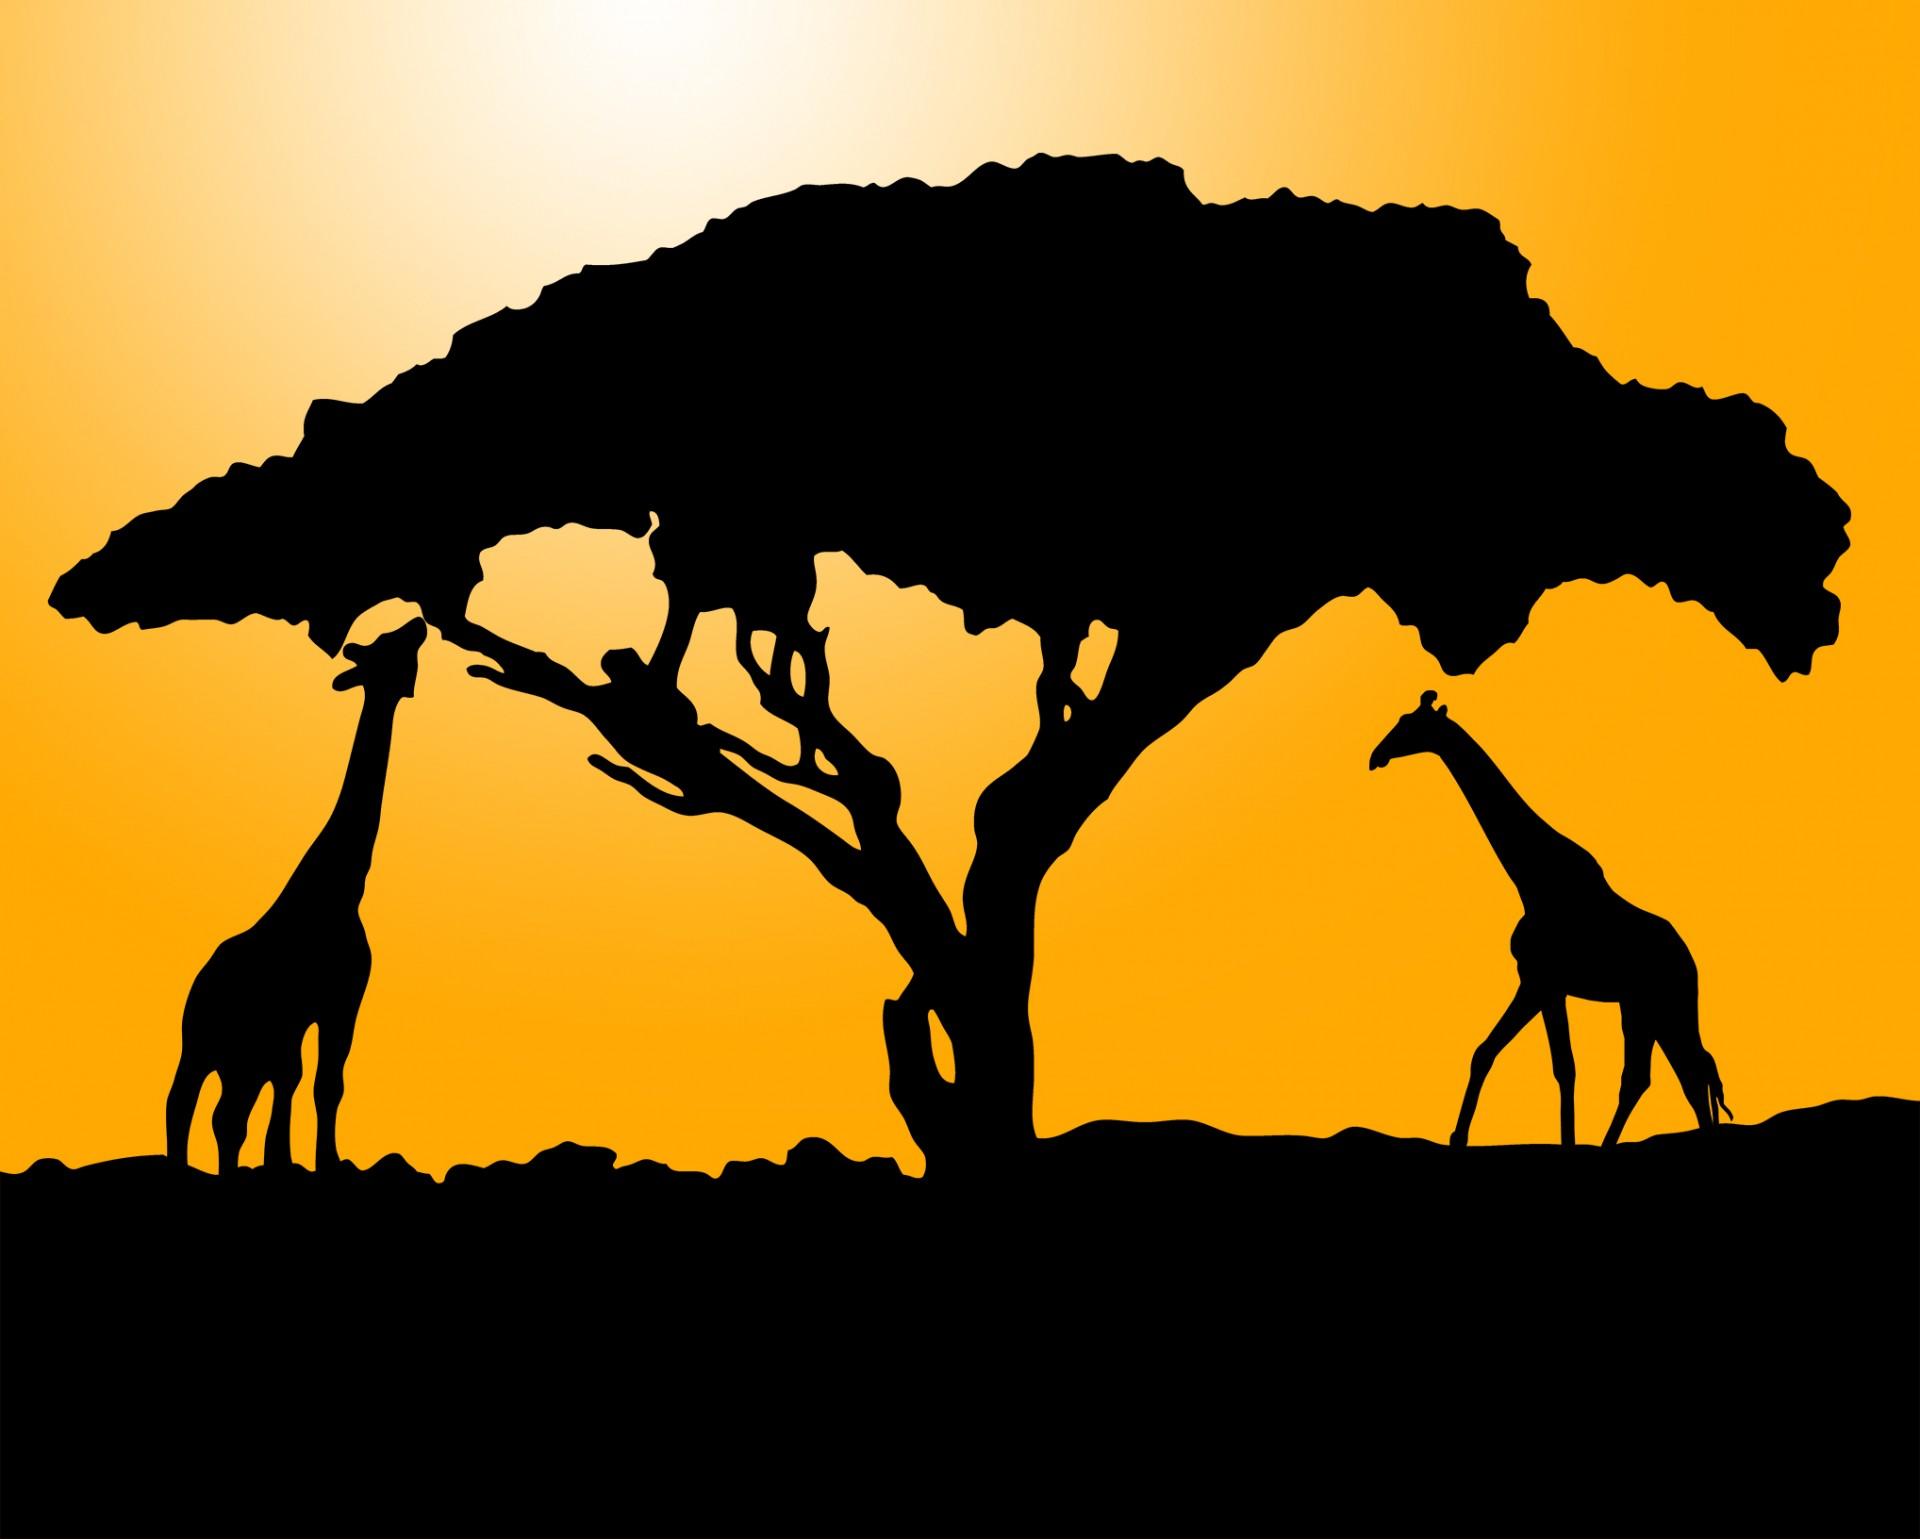 1920x1539 Giraffe Silhouette At Sunset Free Stock Photo